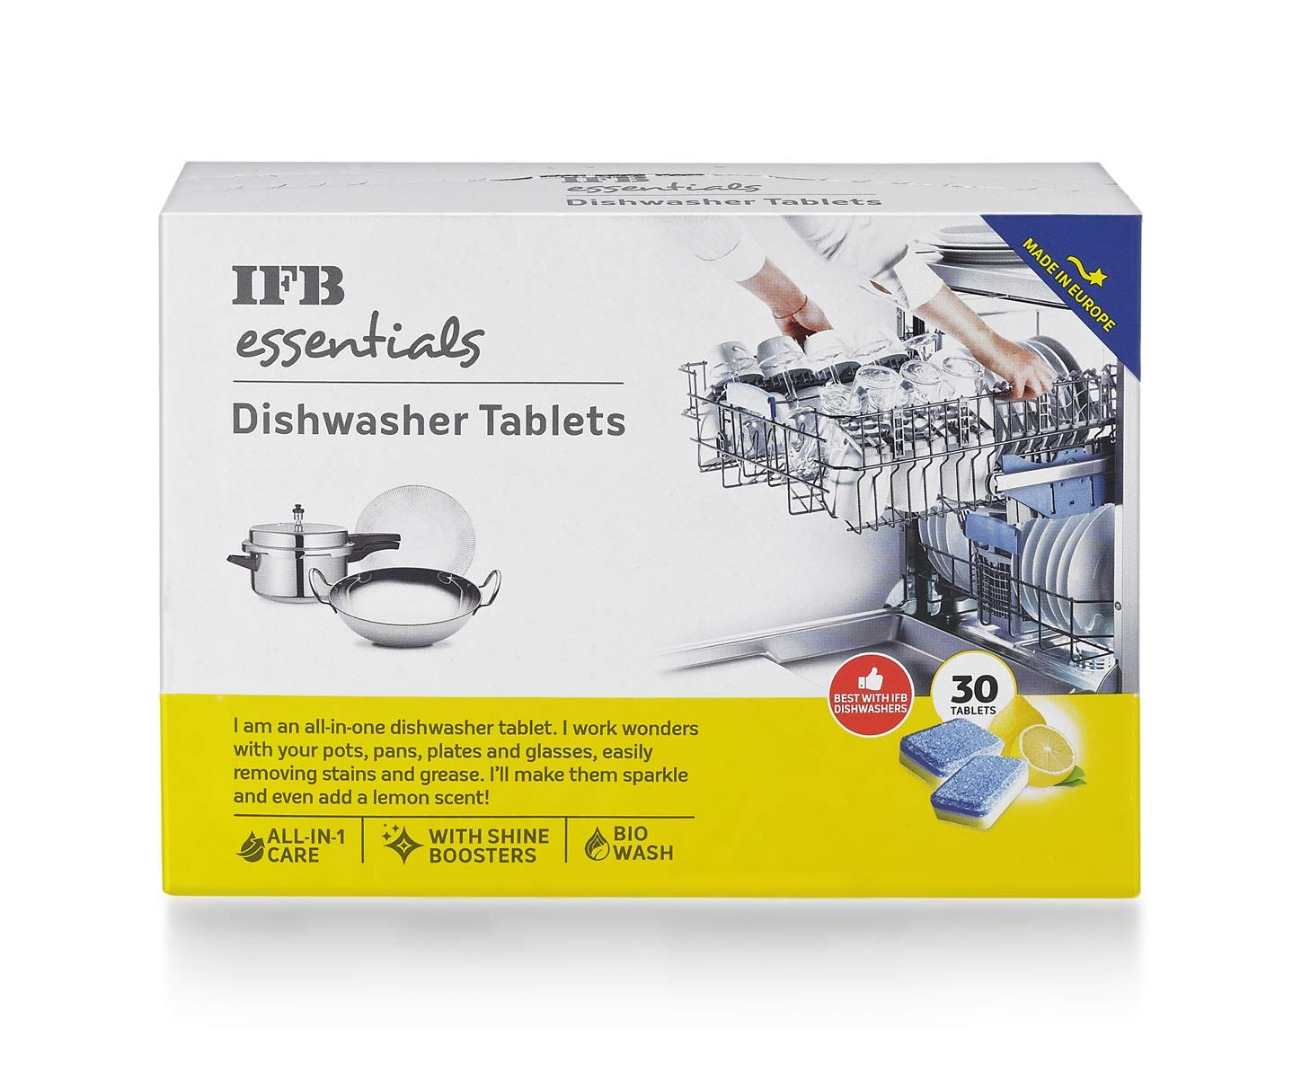 IFB ESSENTIALS DISHWASHER TABLETS'